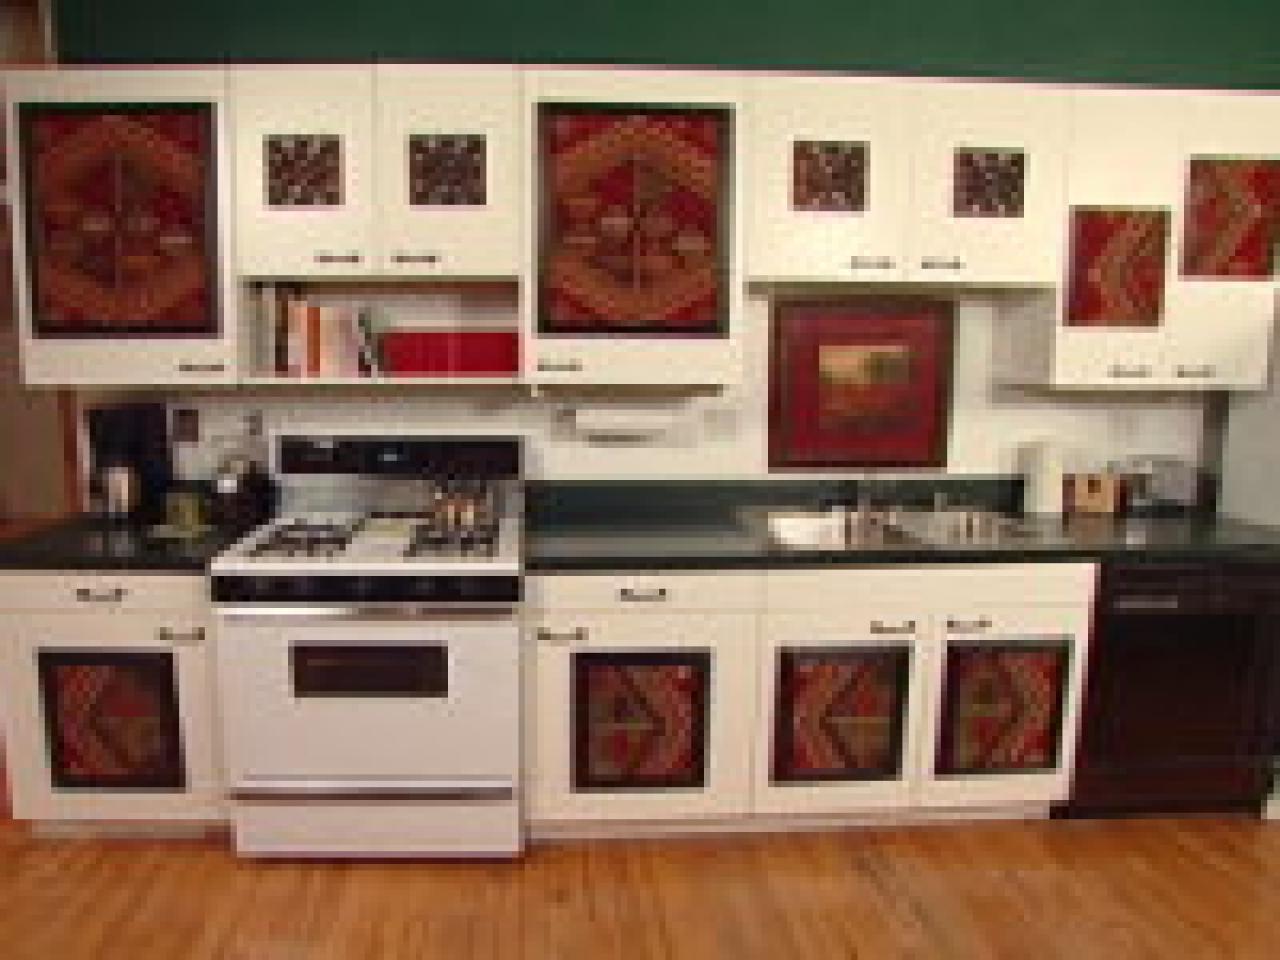 kitchen cabinet facelift ideas photo - 3